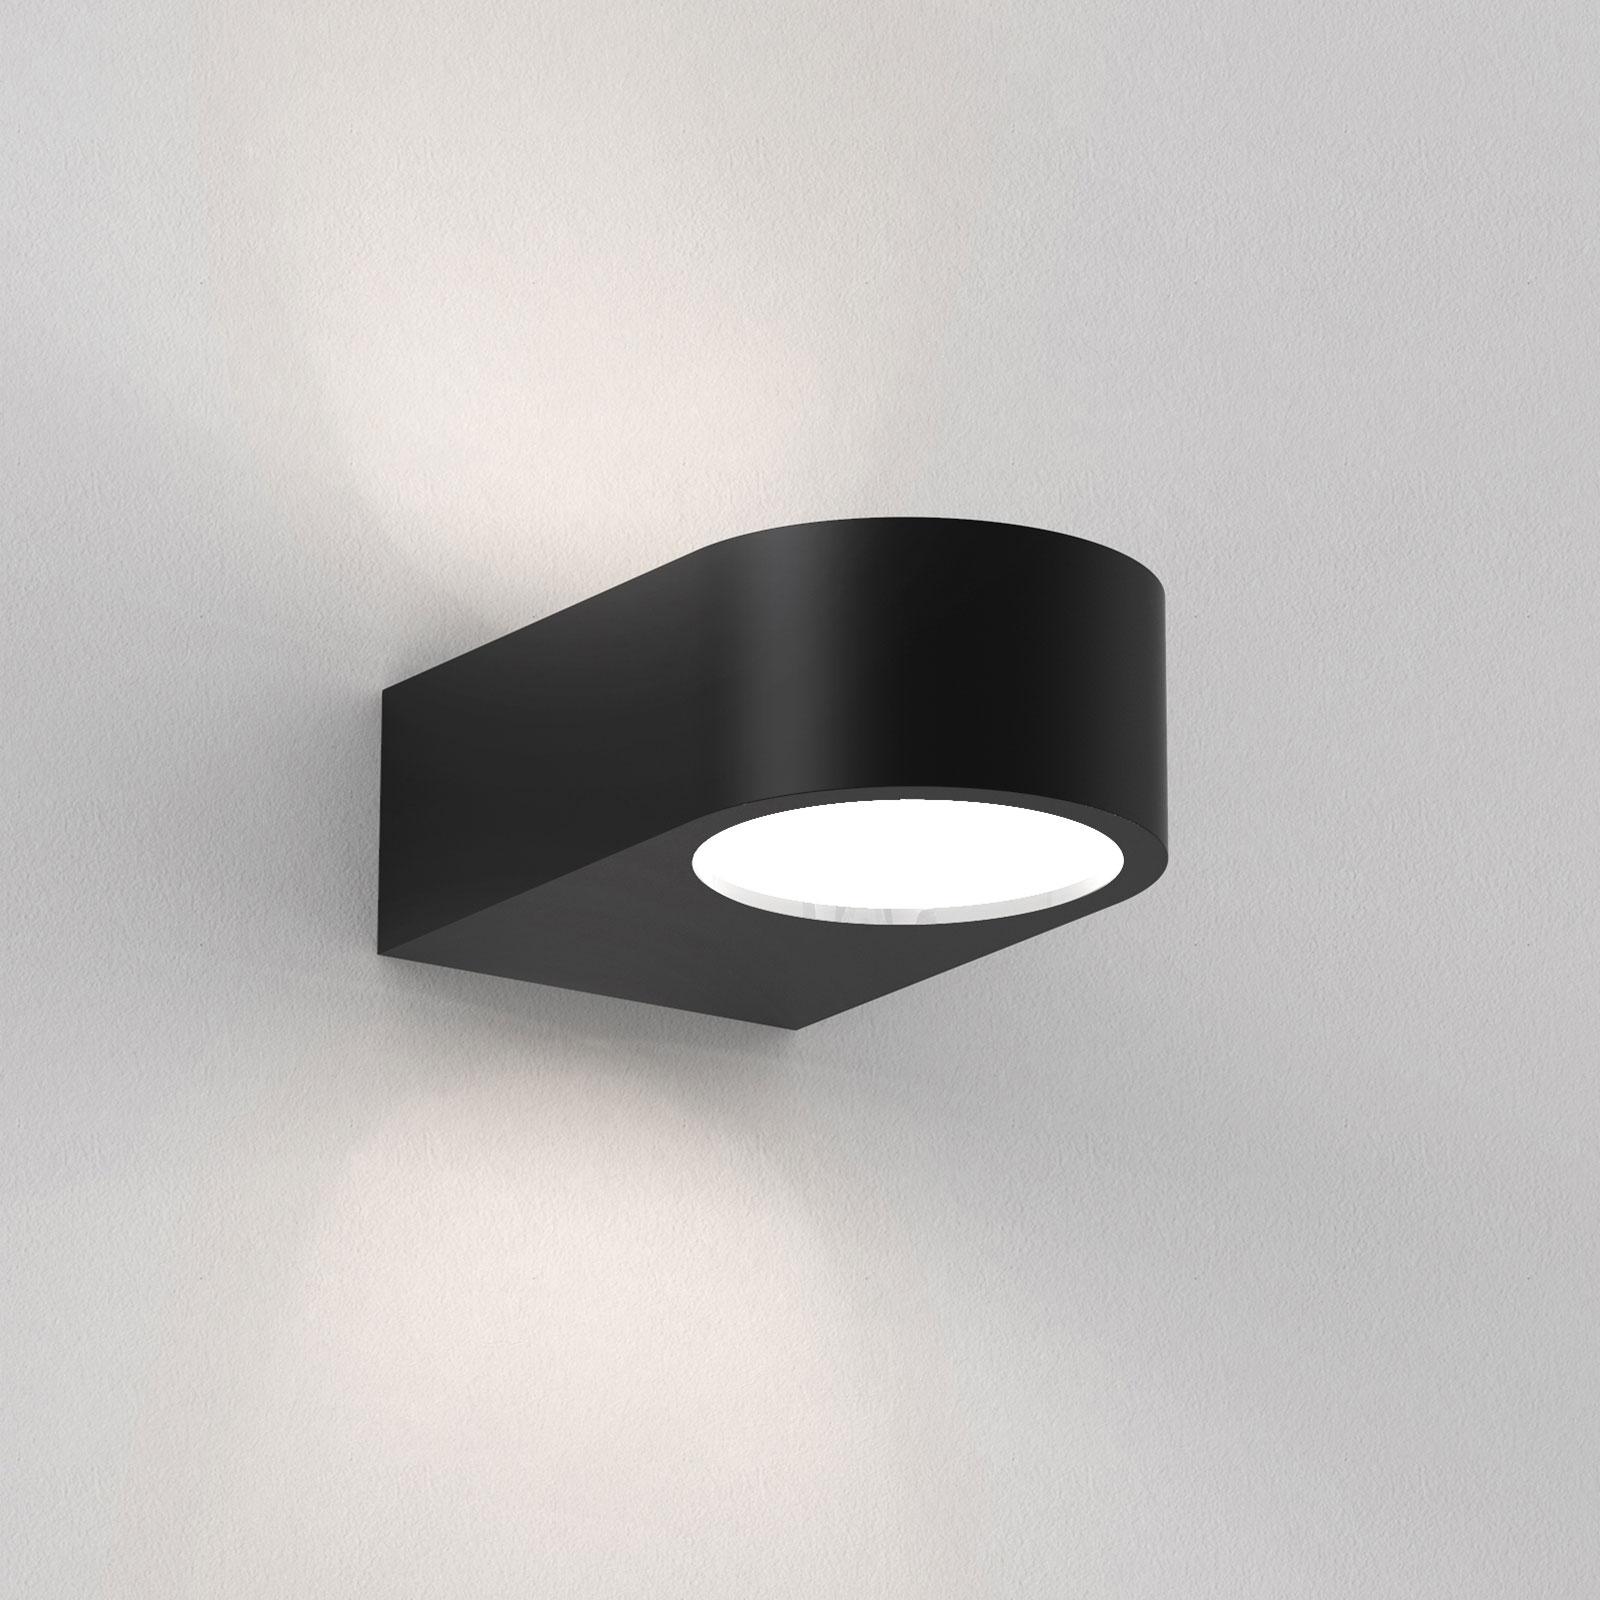 Astro Epsilon LED wandlamp up & down, zwart